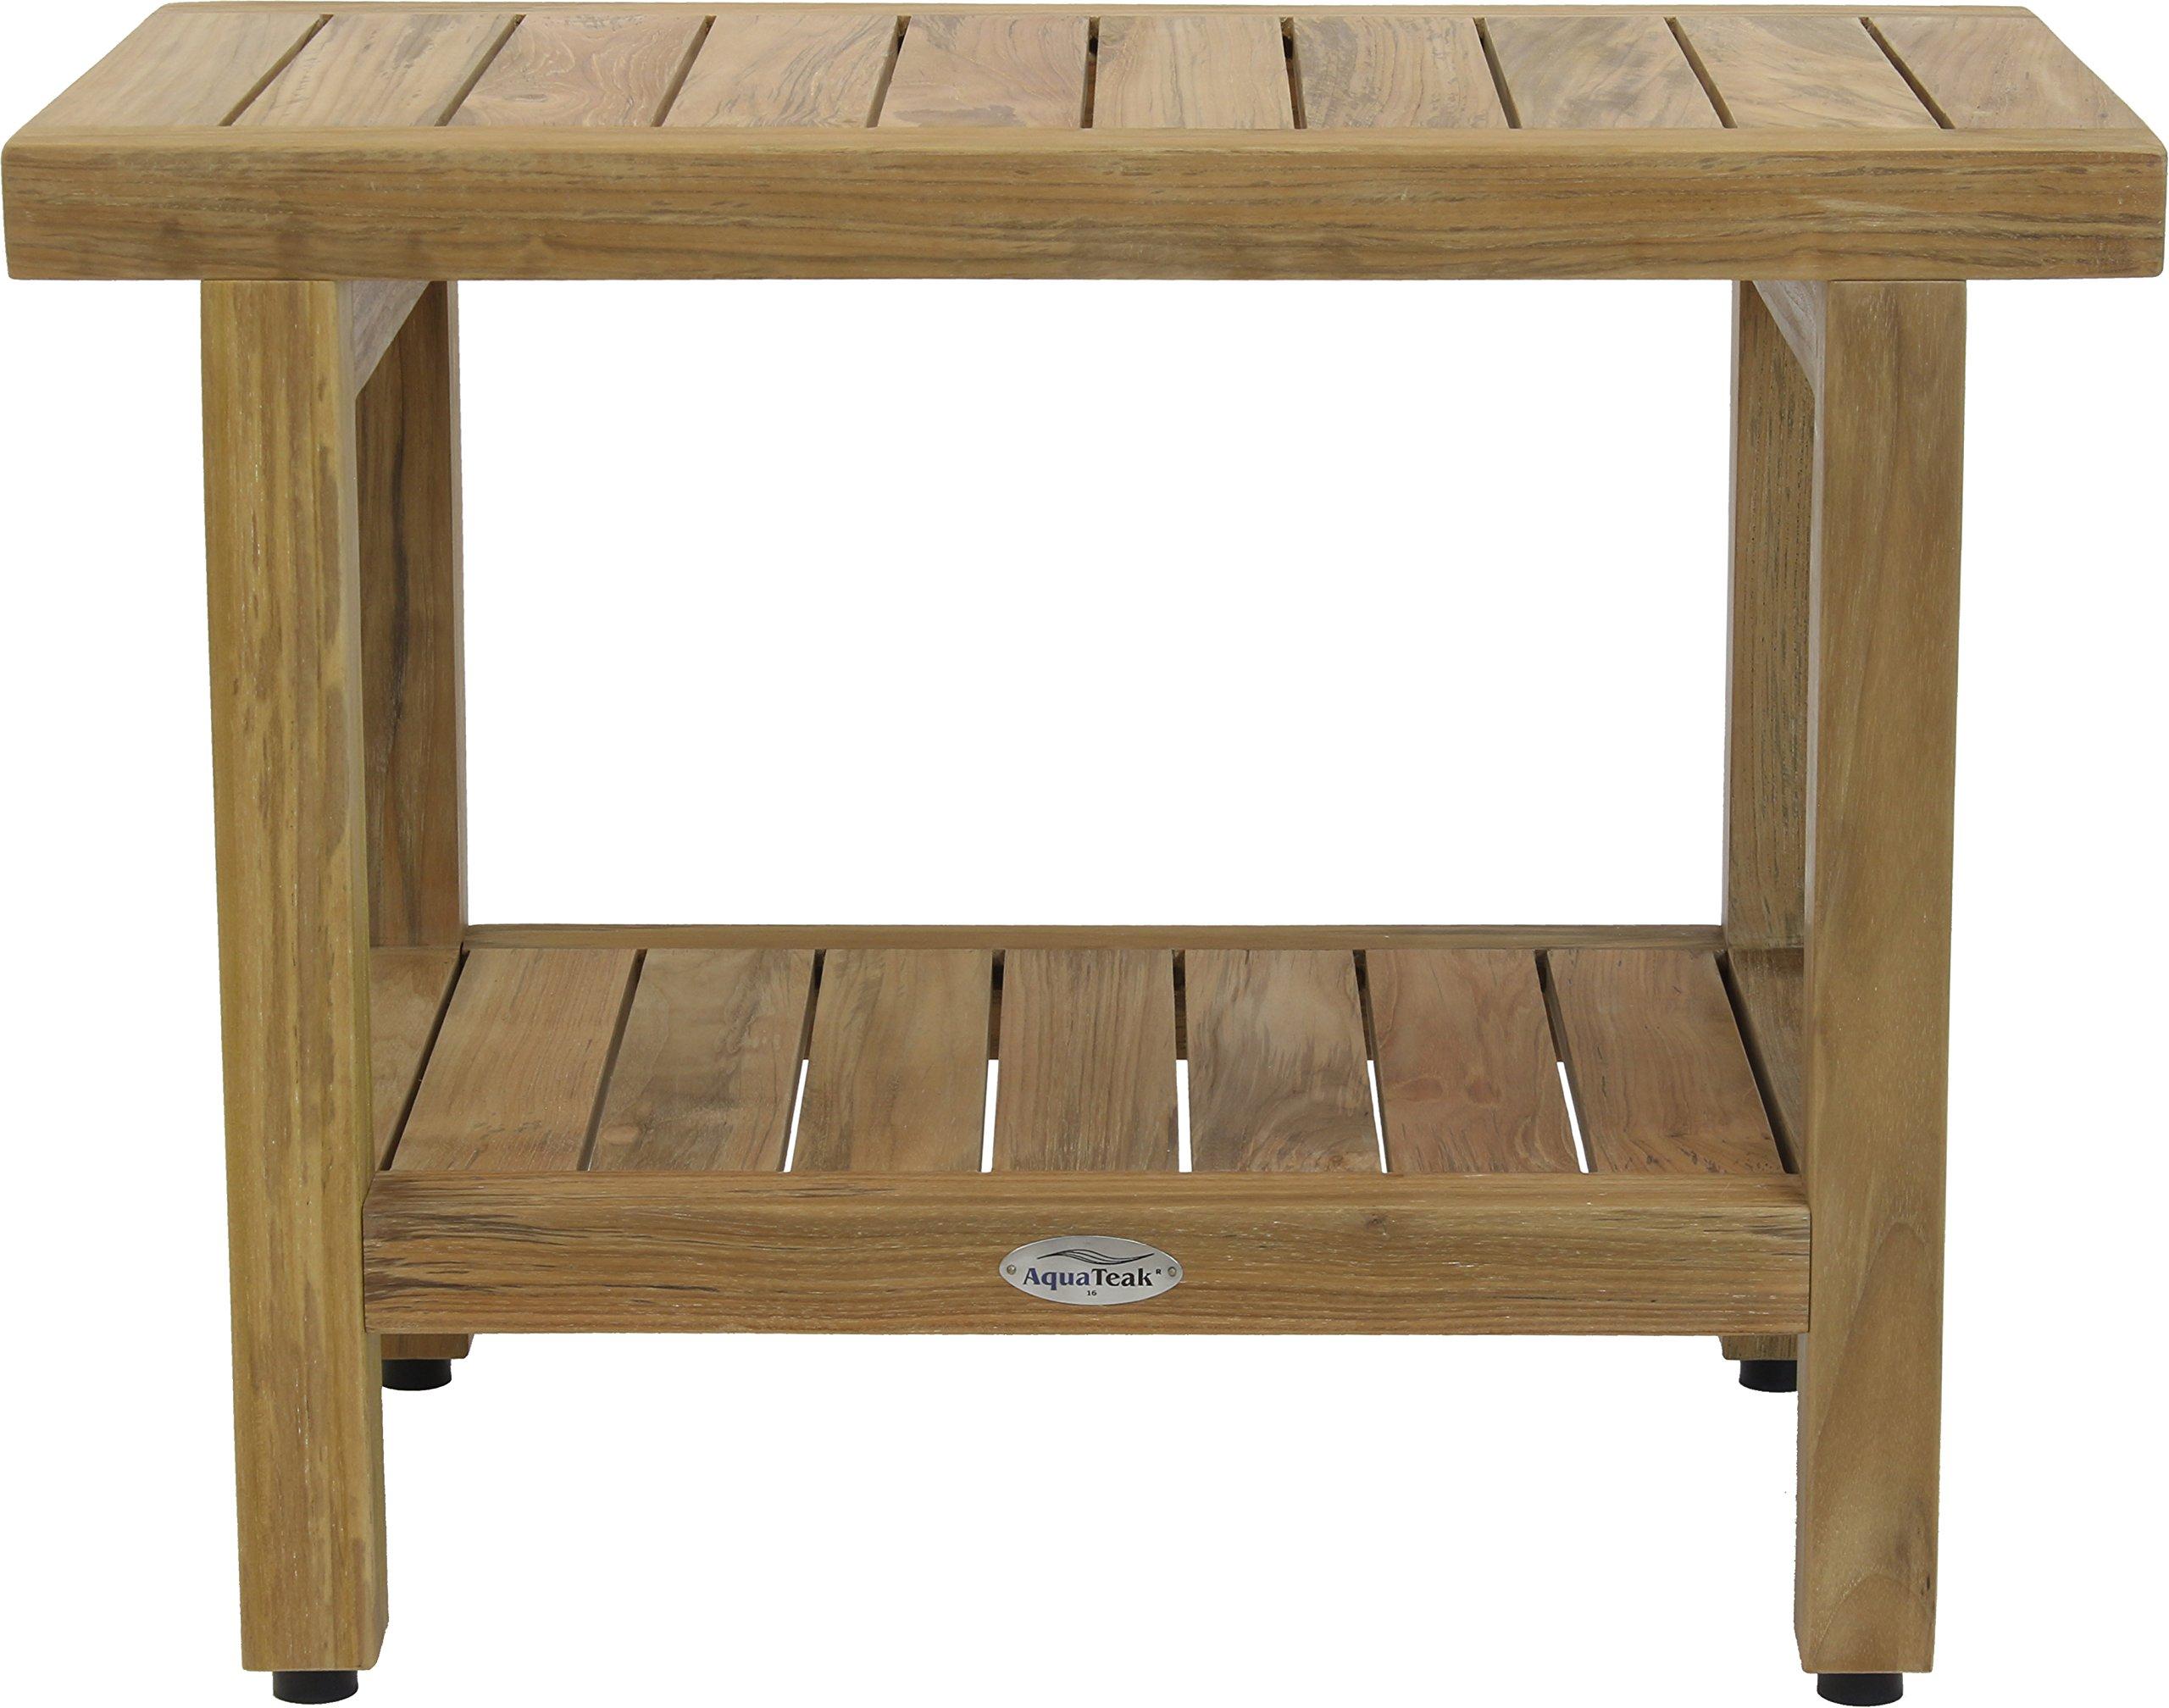 24'' Spa Natural Teak Shower Bench with Shelf by AquaTeak (Image #7)